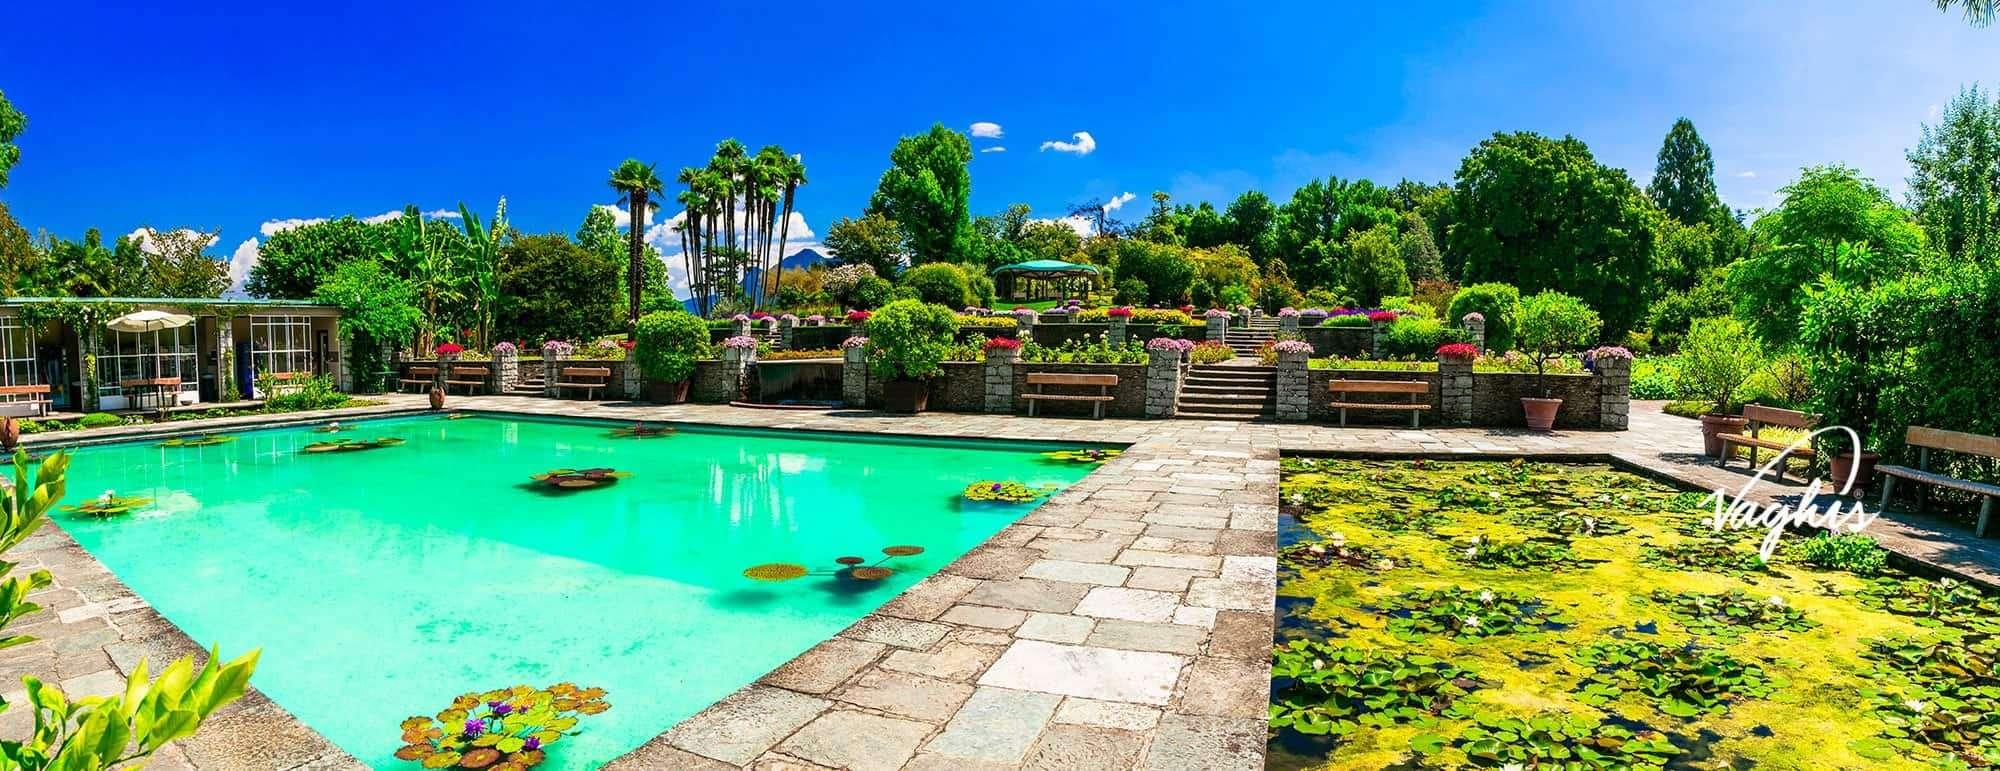 Villa Taranto - © Vaghis - viaggi & turismo Italia - Tutti i diritti riservati